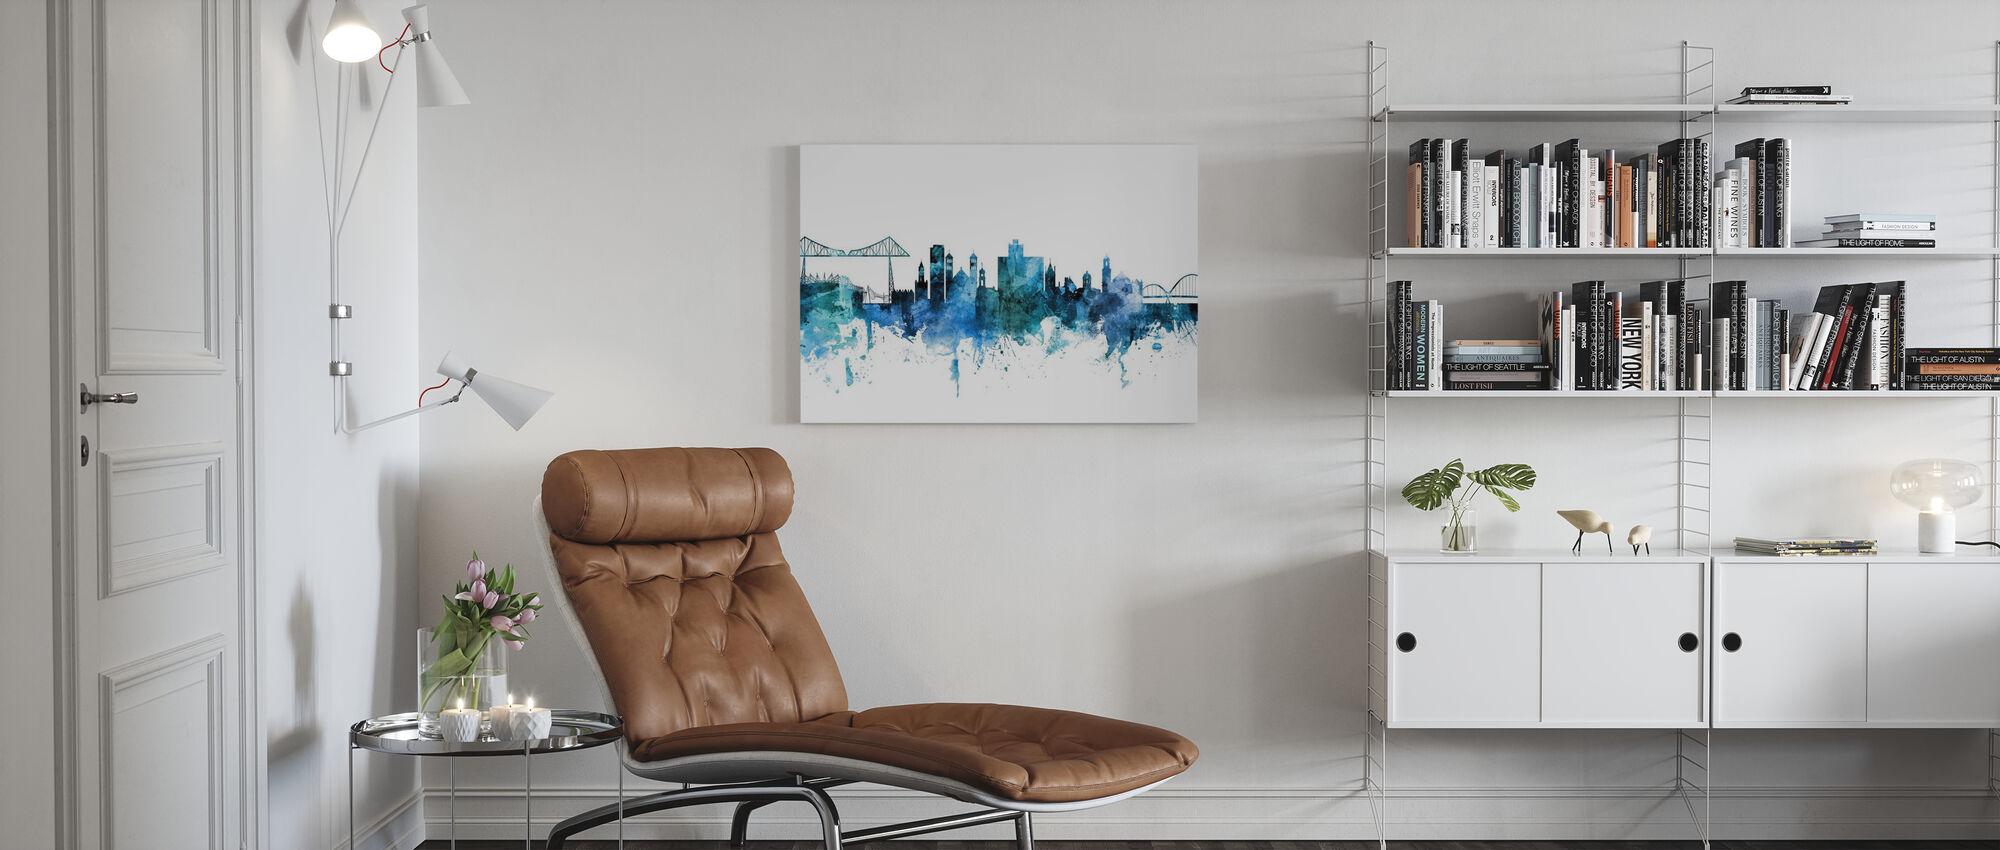 Middlesbrough England Skyline - Canvas print - Living Room